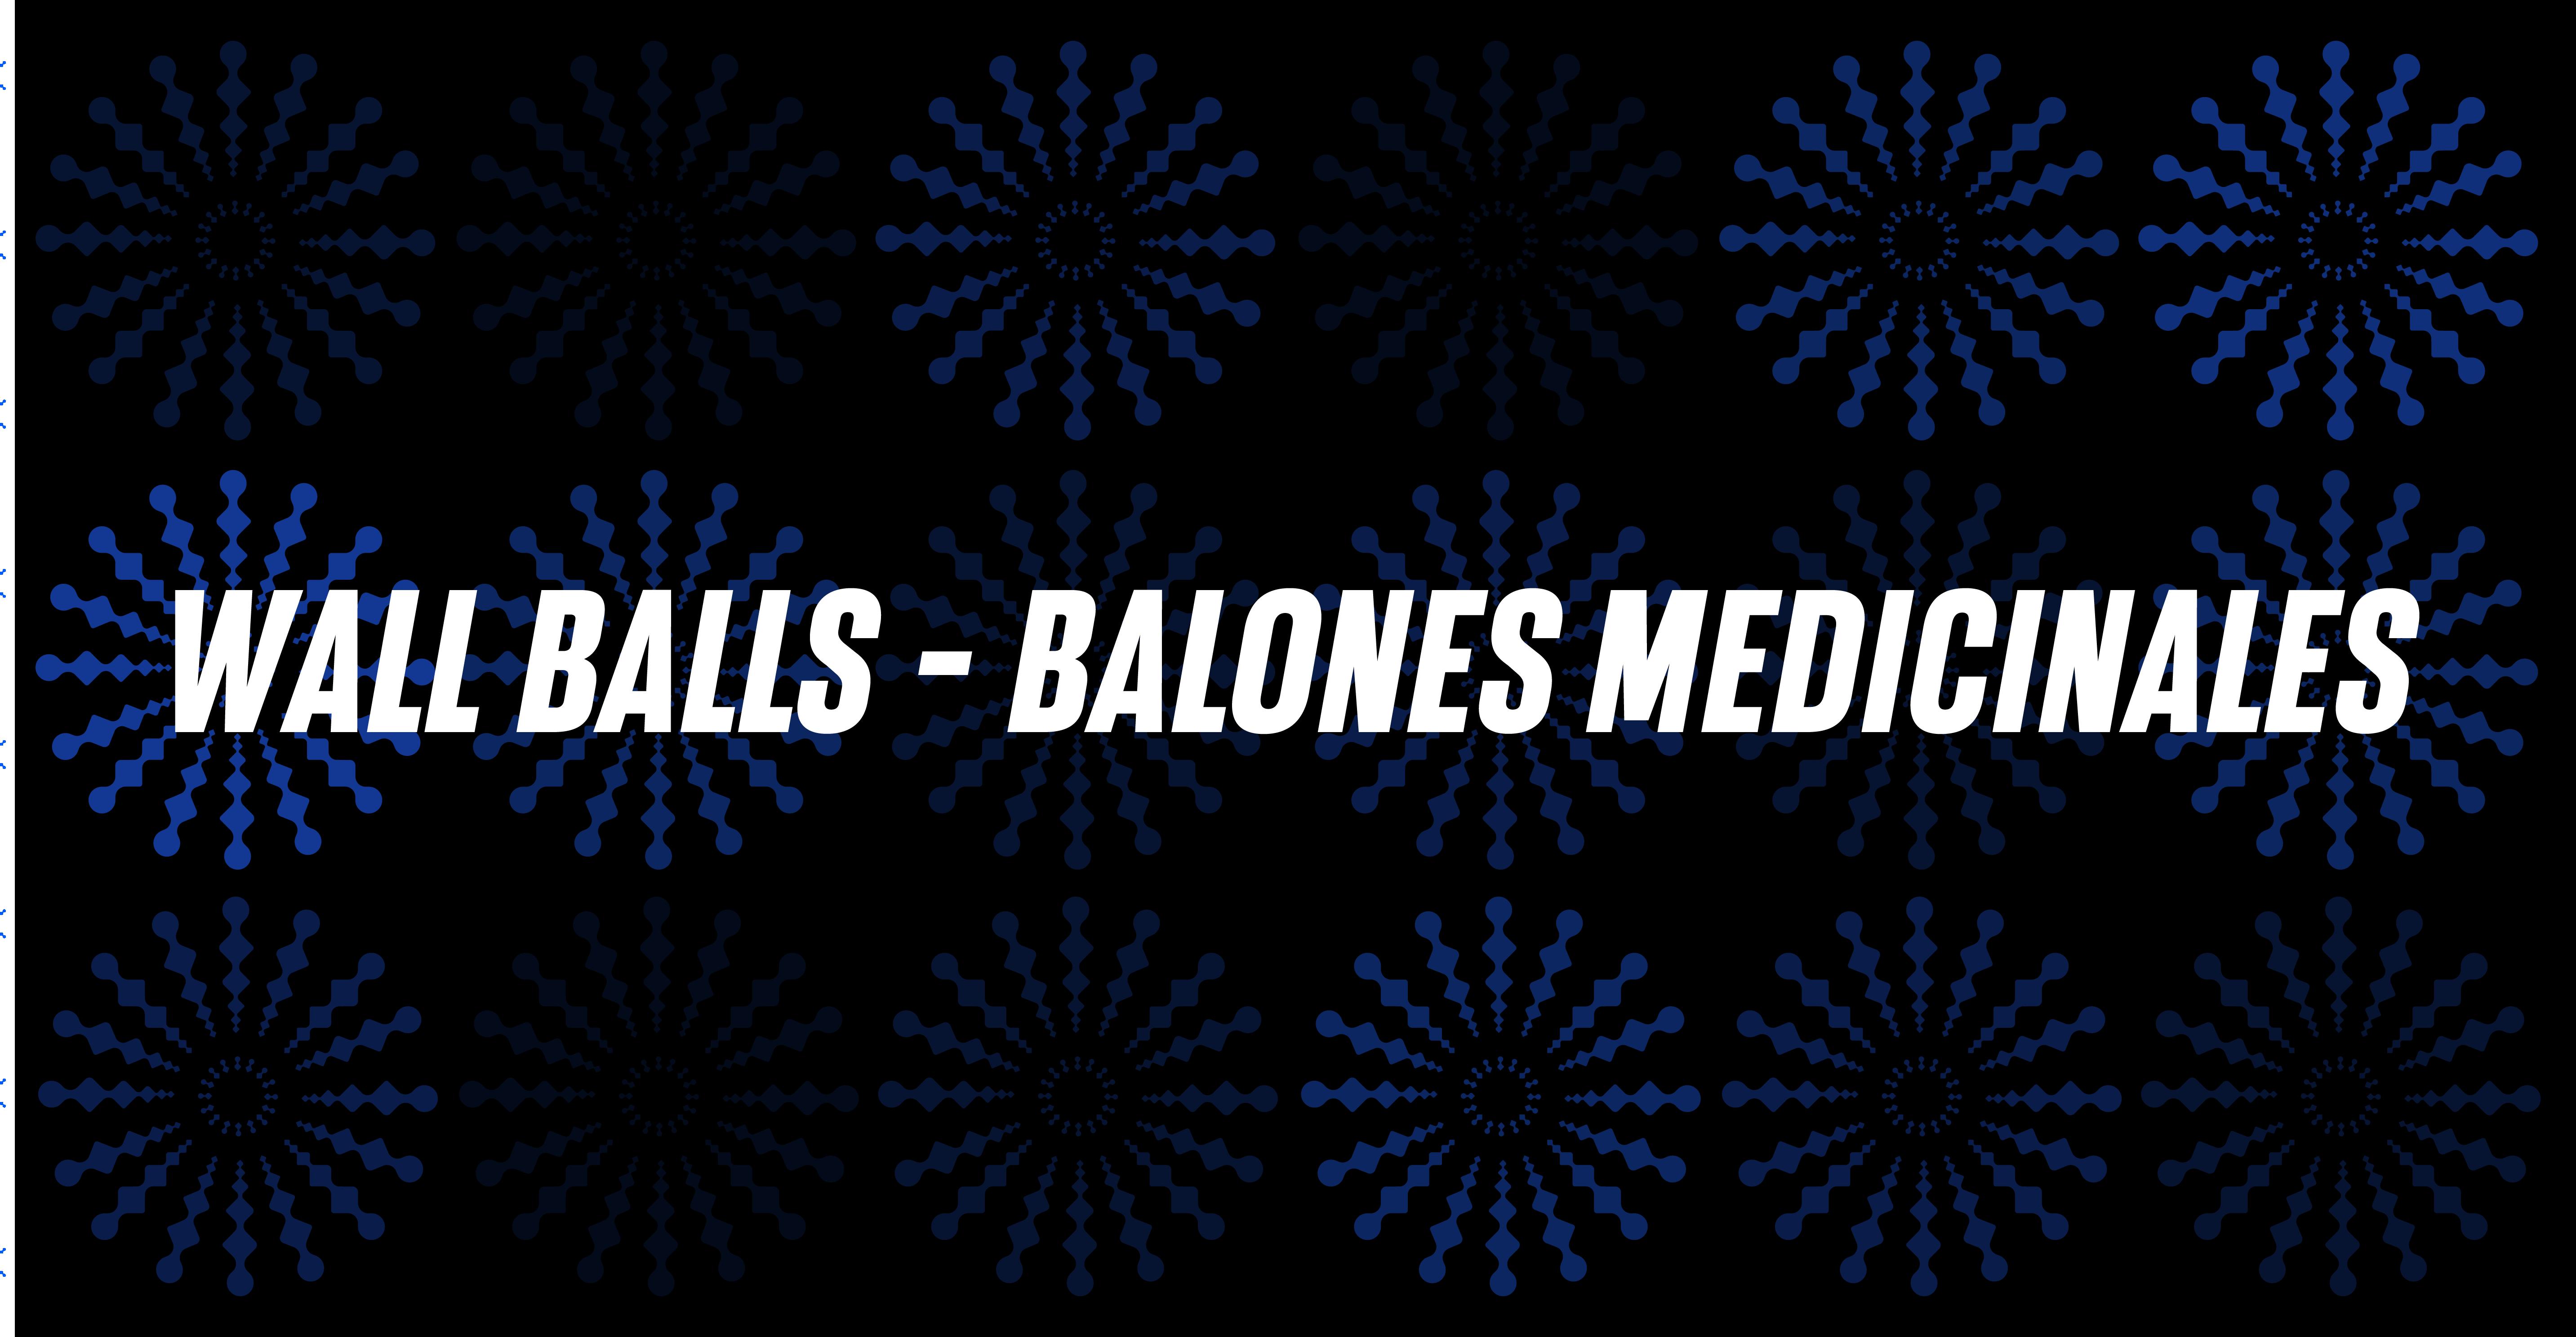 Wall Balls & Balones Medicinales